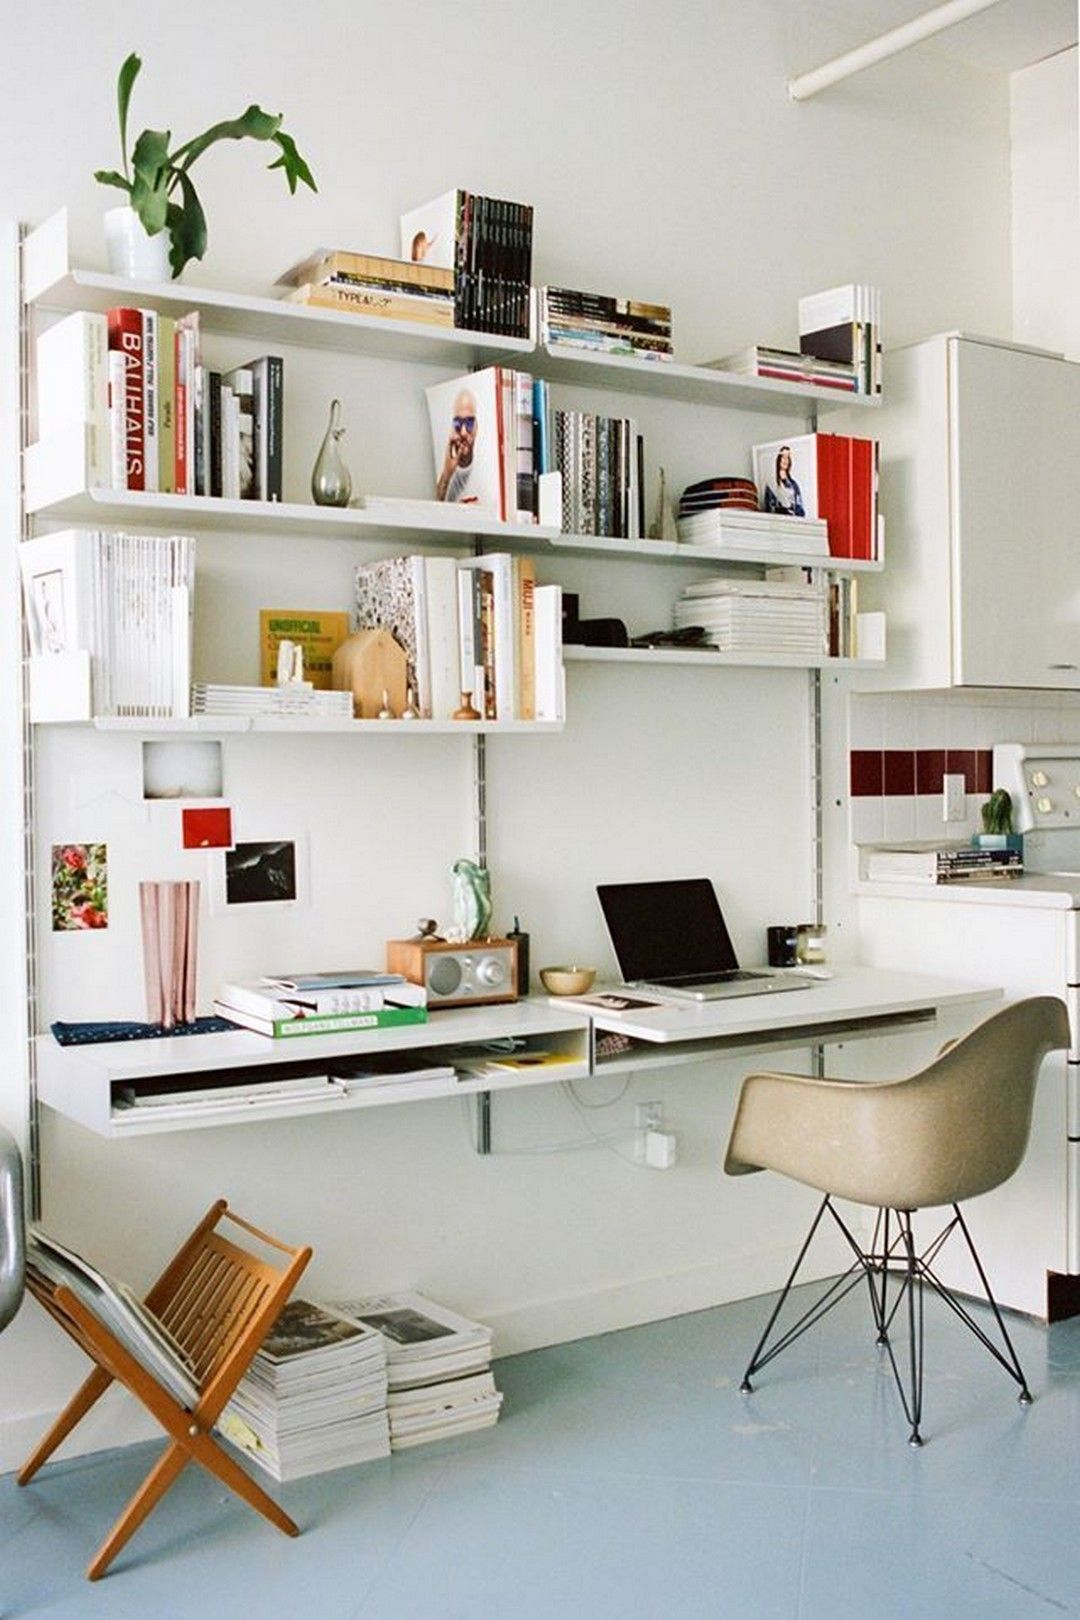 Top 30 Stunning Office Design Homeoffice Homeofficeofwalmart Homeofficeorganization Homeofficesetup Homeofficeshelving Home Interior Home Office